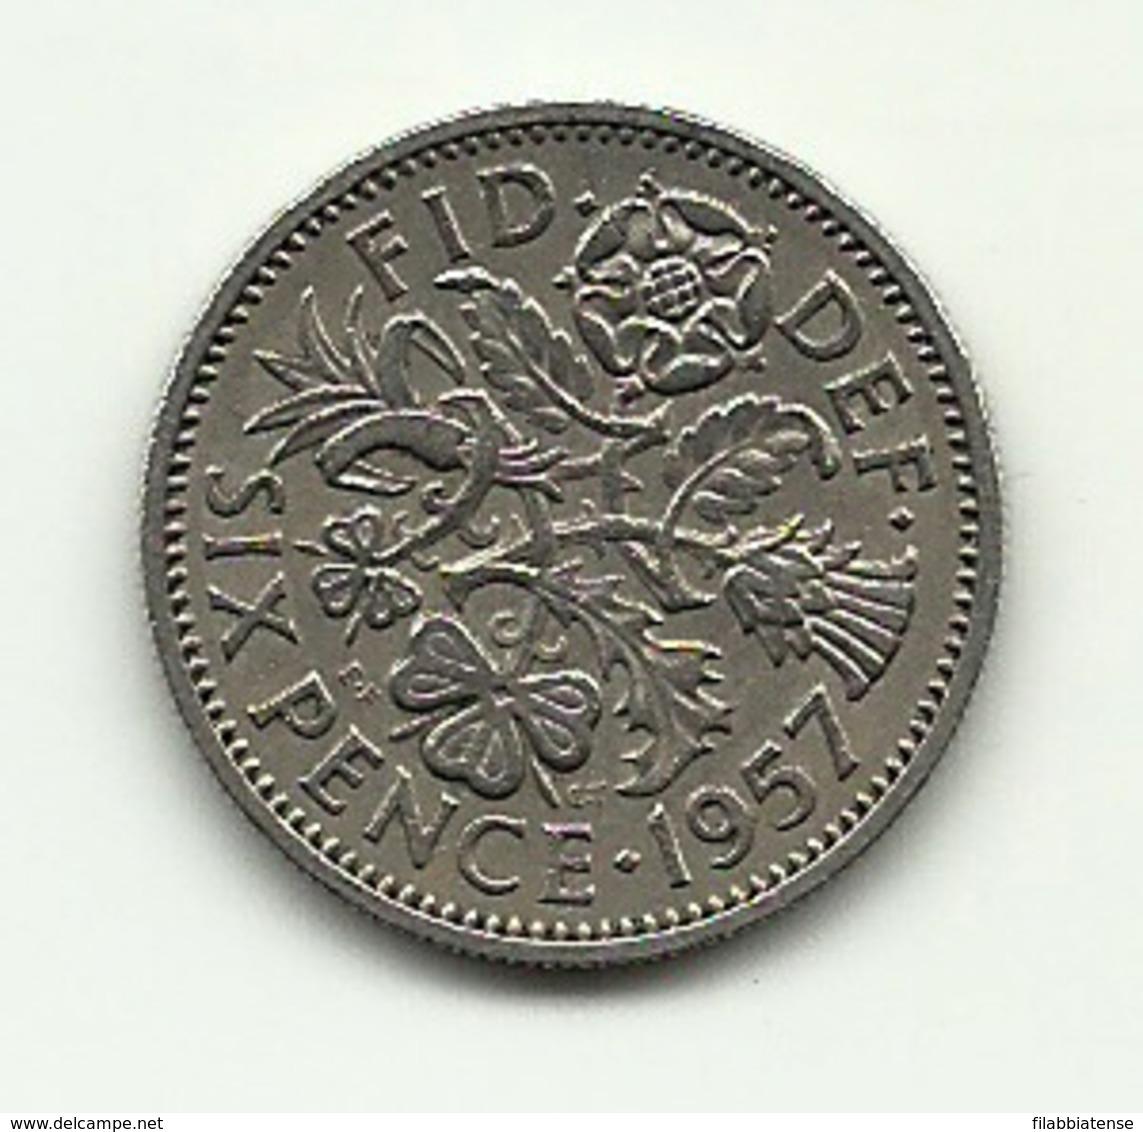 1957 - Gran Bretagna 6 Pence - Altri